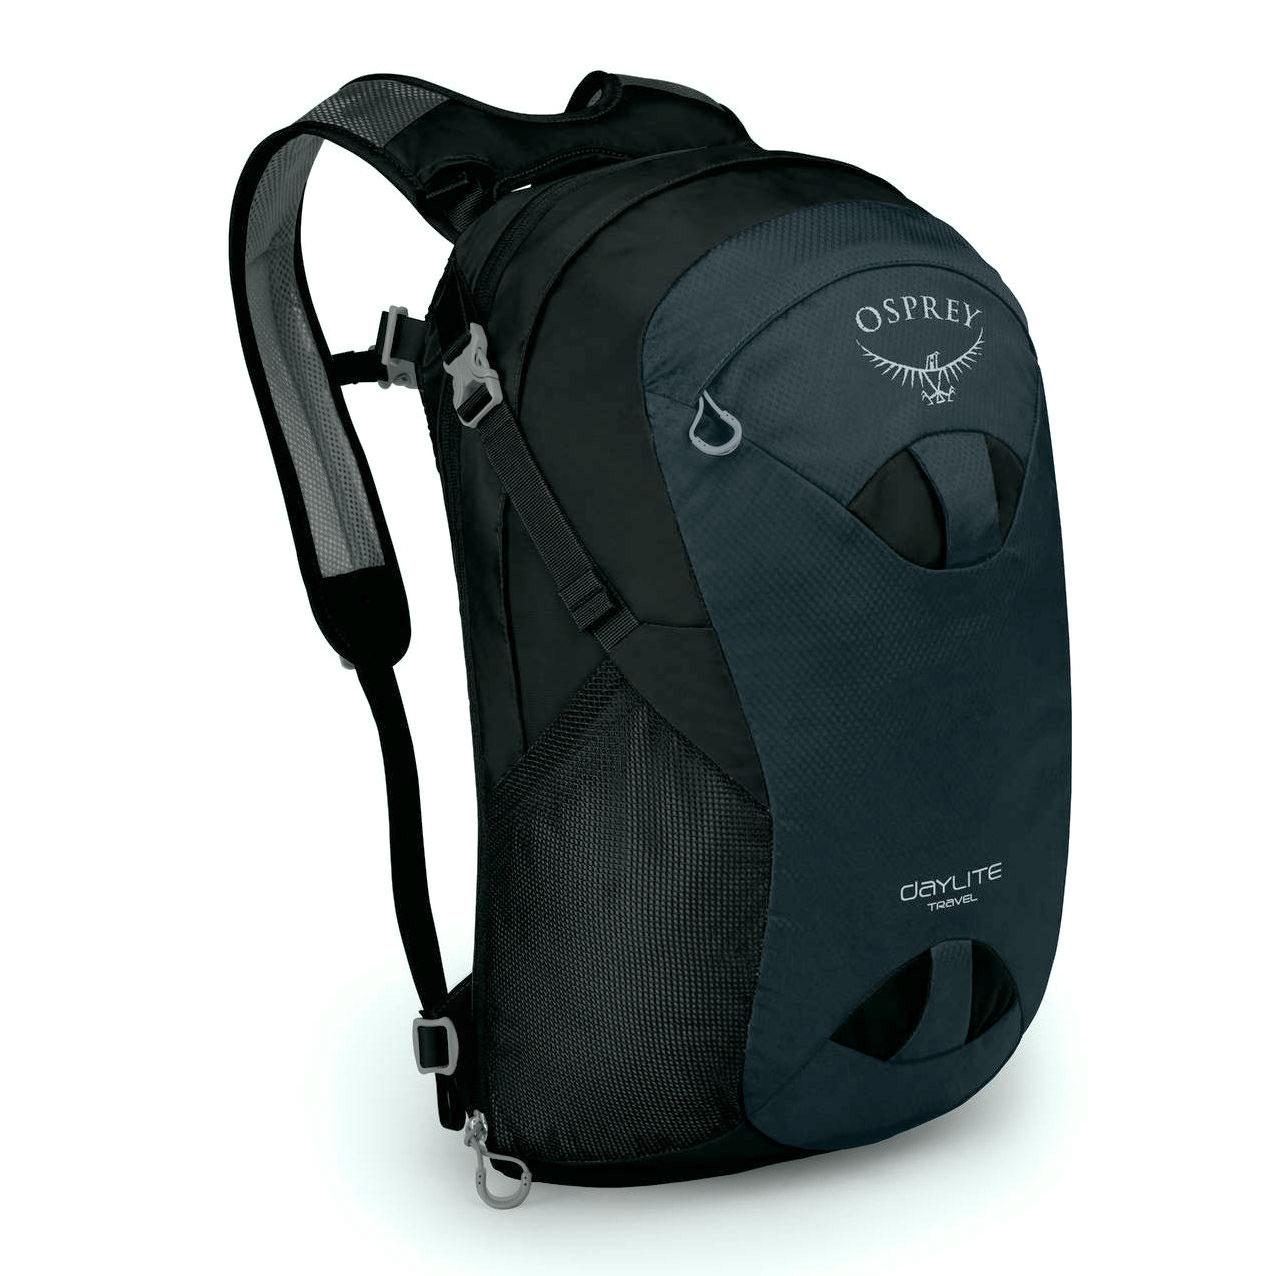 Osprey Daylite Travel 24 - Backpack - Black